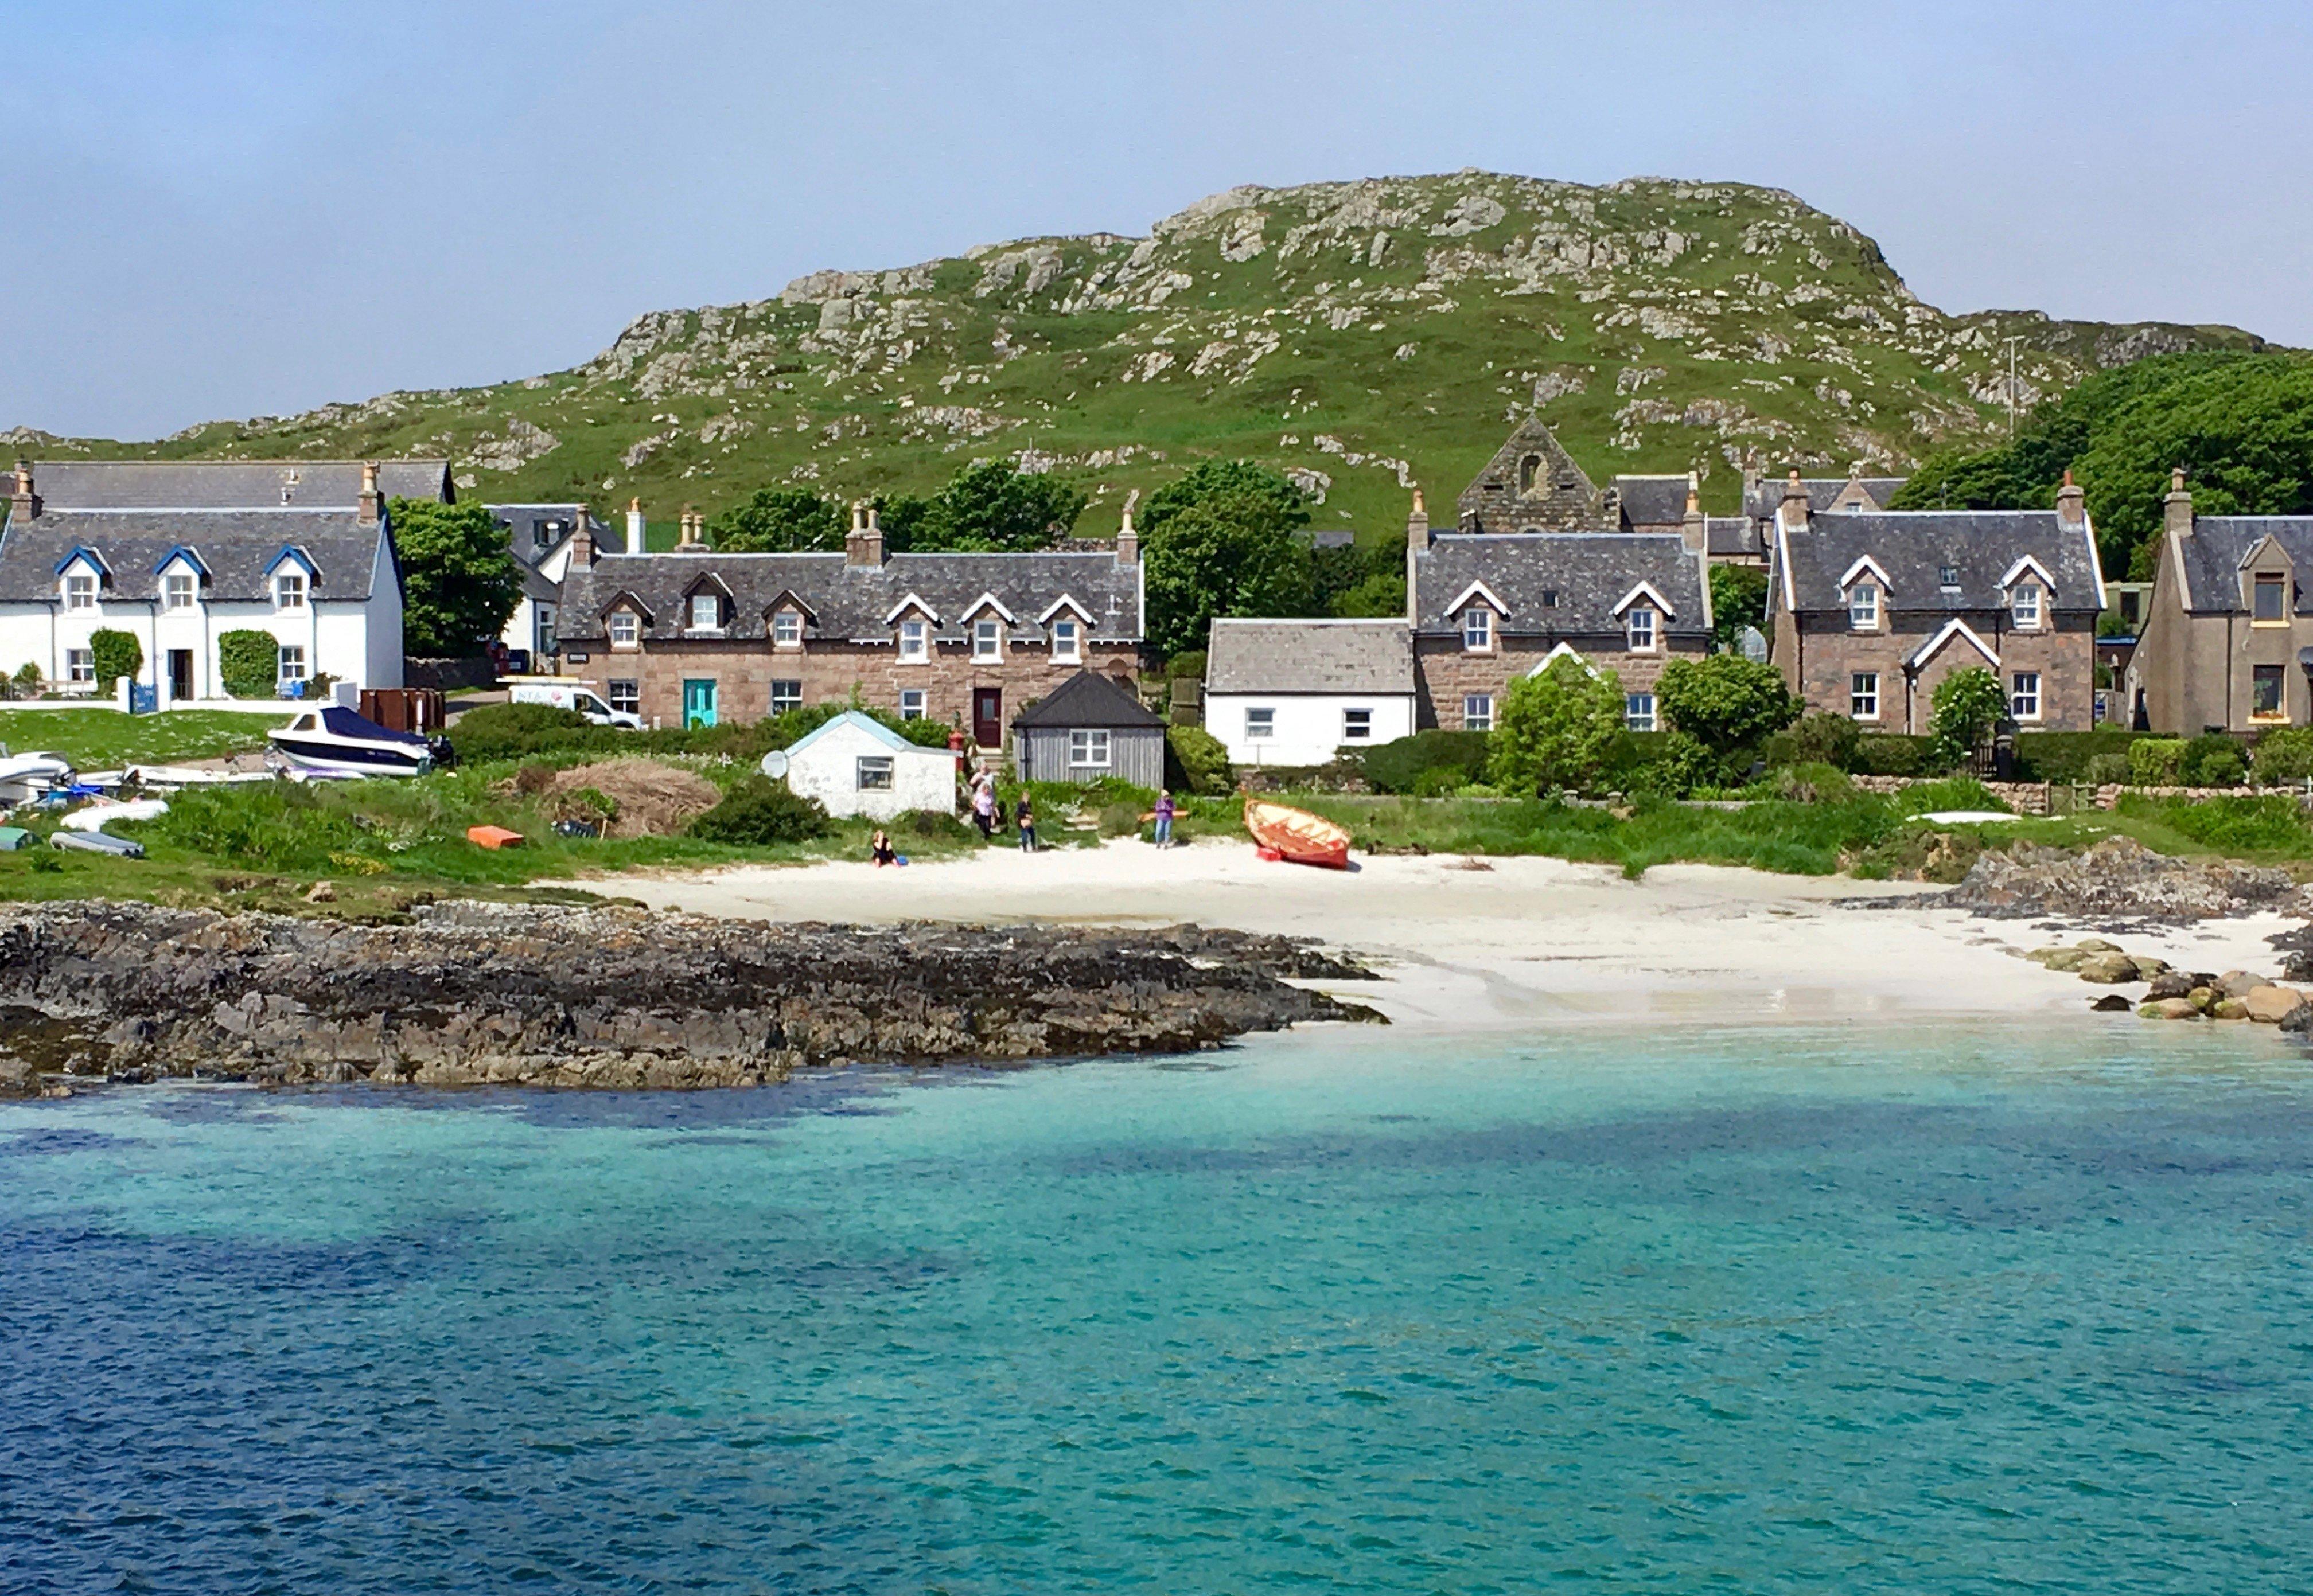 The shoreline of Iona. Photos: Julie Orr-Wilson